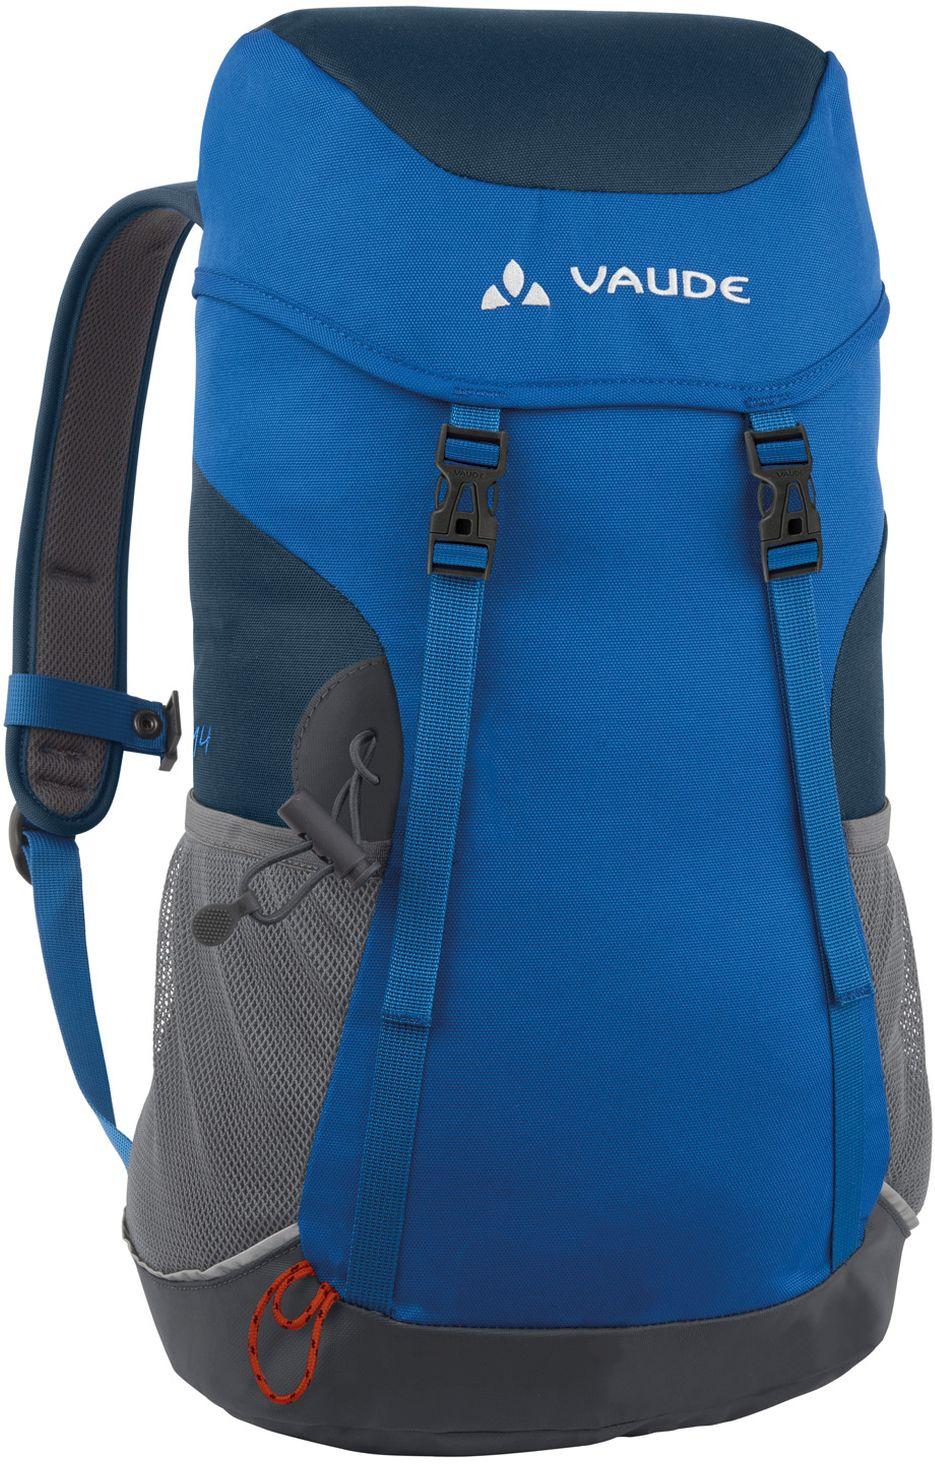 Vaude Puck 14 - marine/blue uni